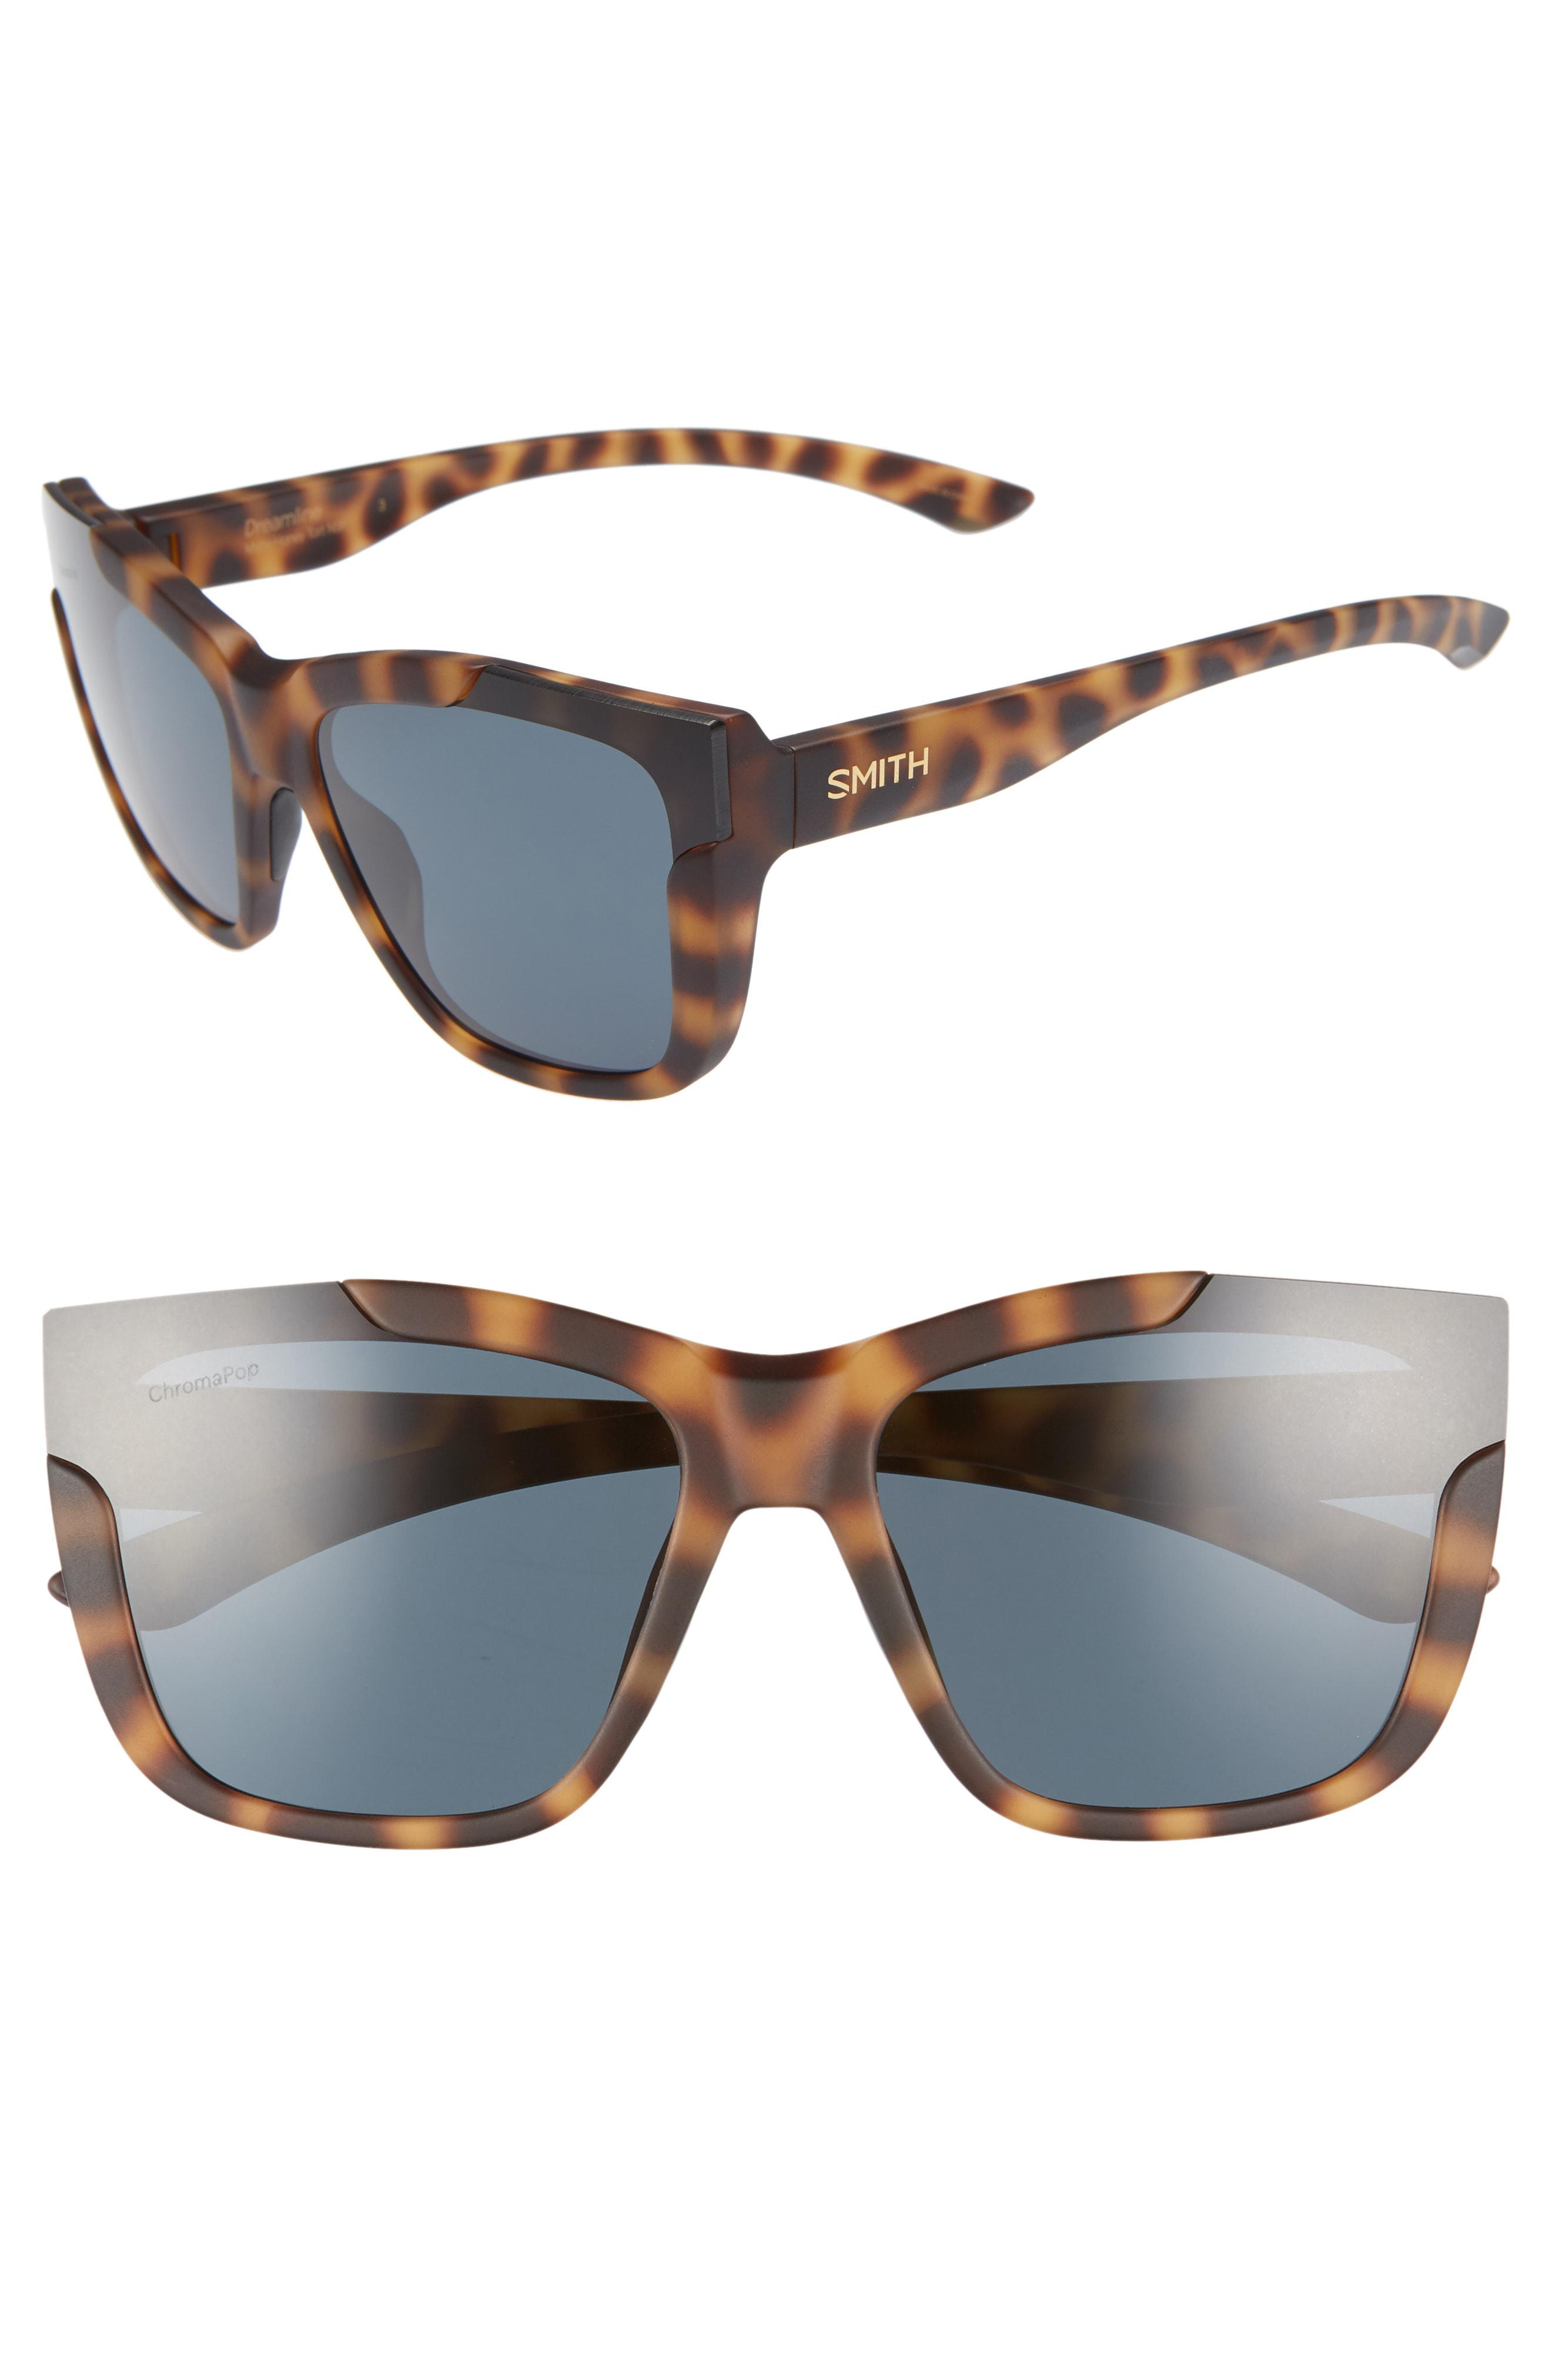 a4a56d7bff Smith - Blue Dreamline 62mm Butterfly Chromapop(tm) Polarized Sunglasses -  - Lyst. View fullscreen